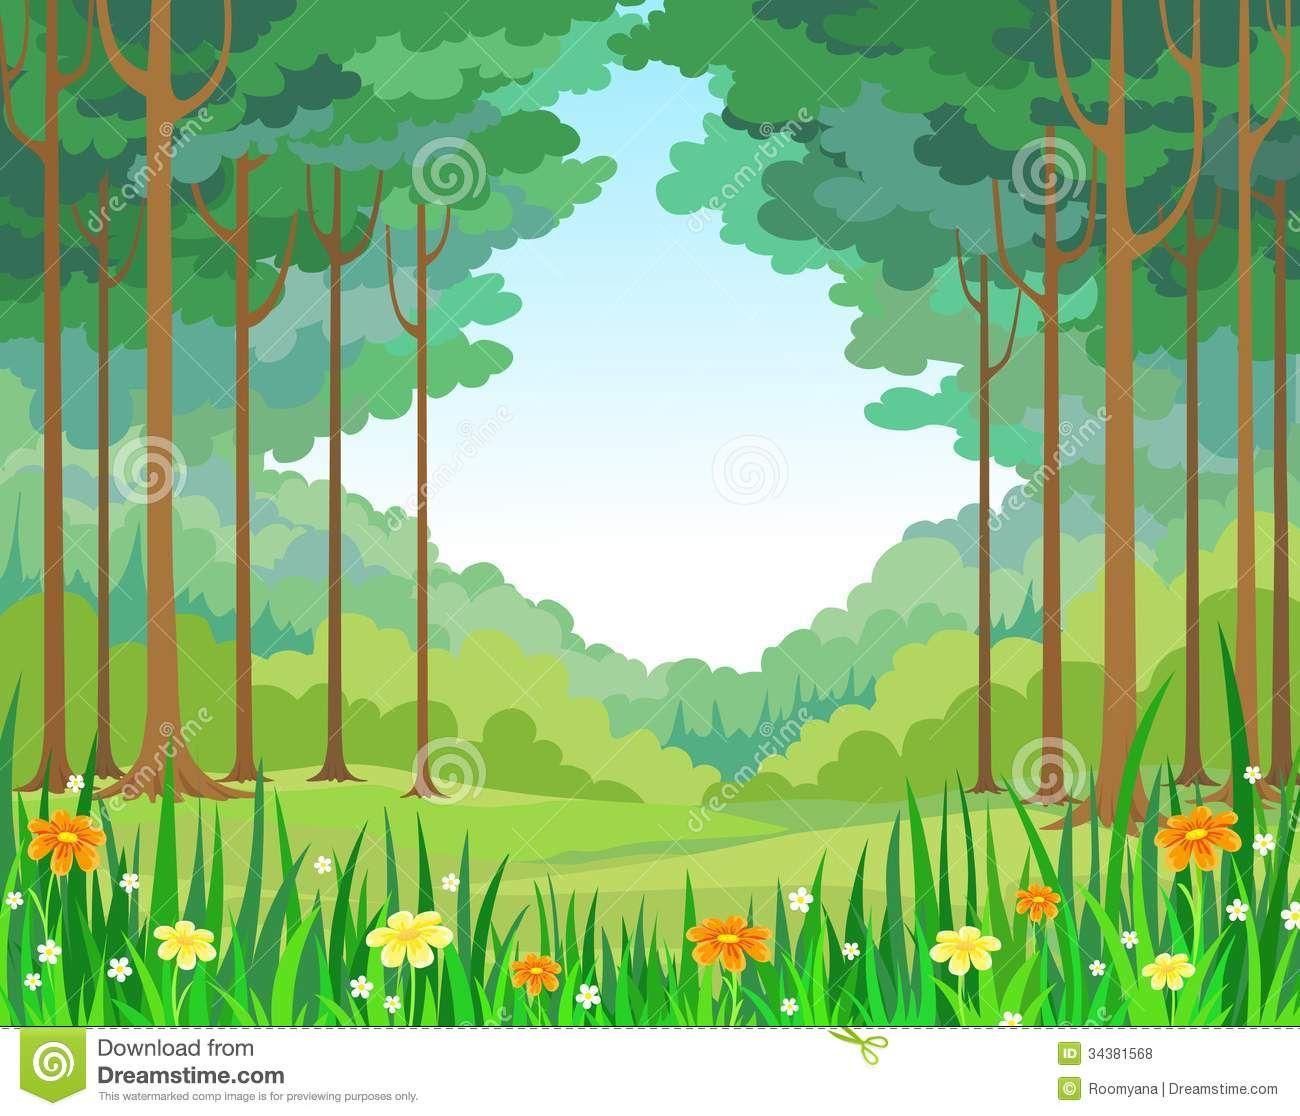 Stylized stock illustrations . Landscape clipart forest